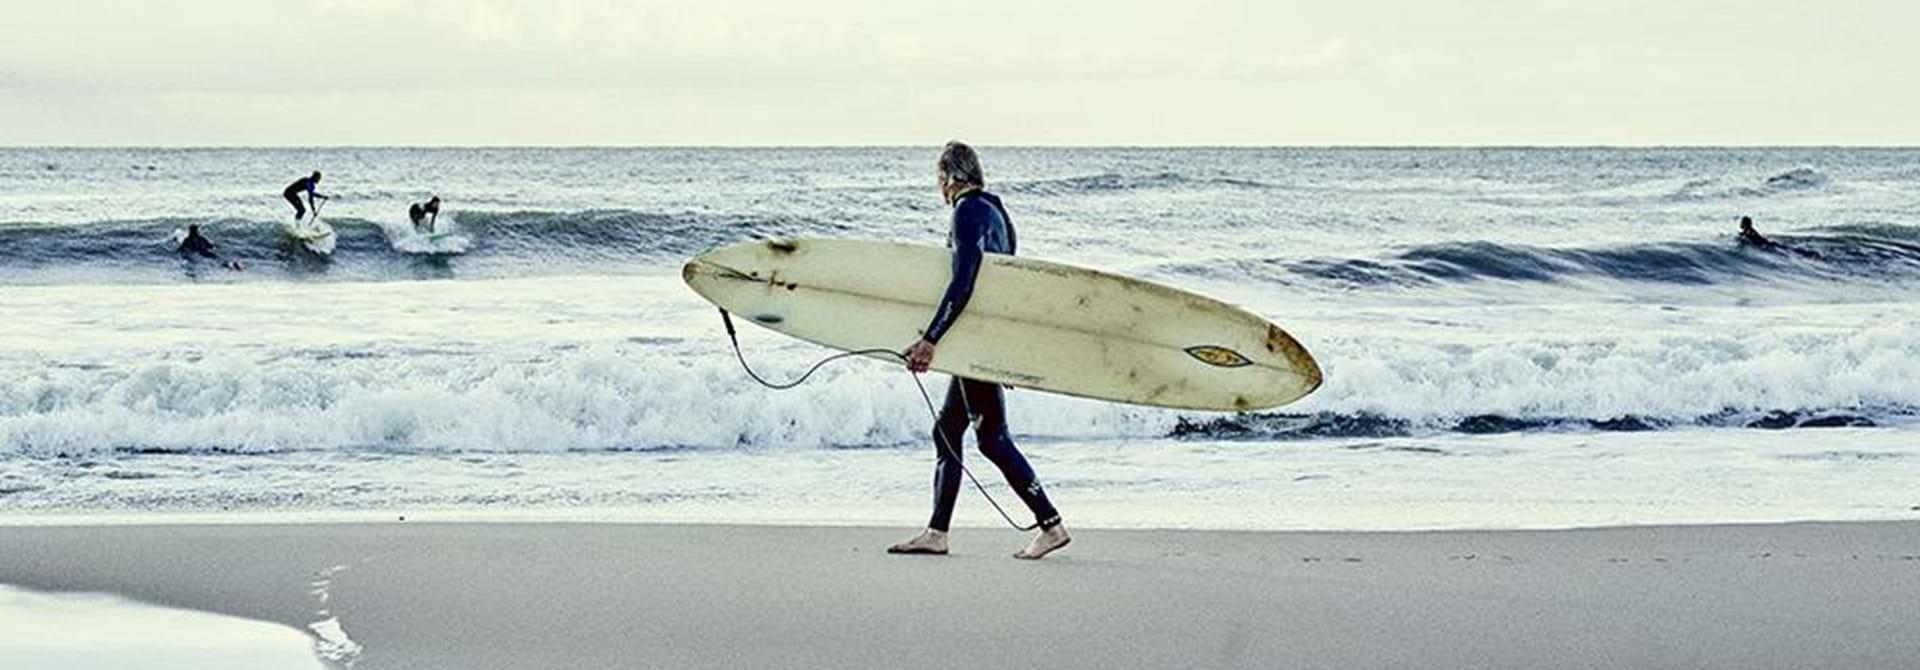 Surf Web